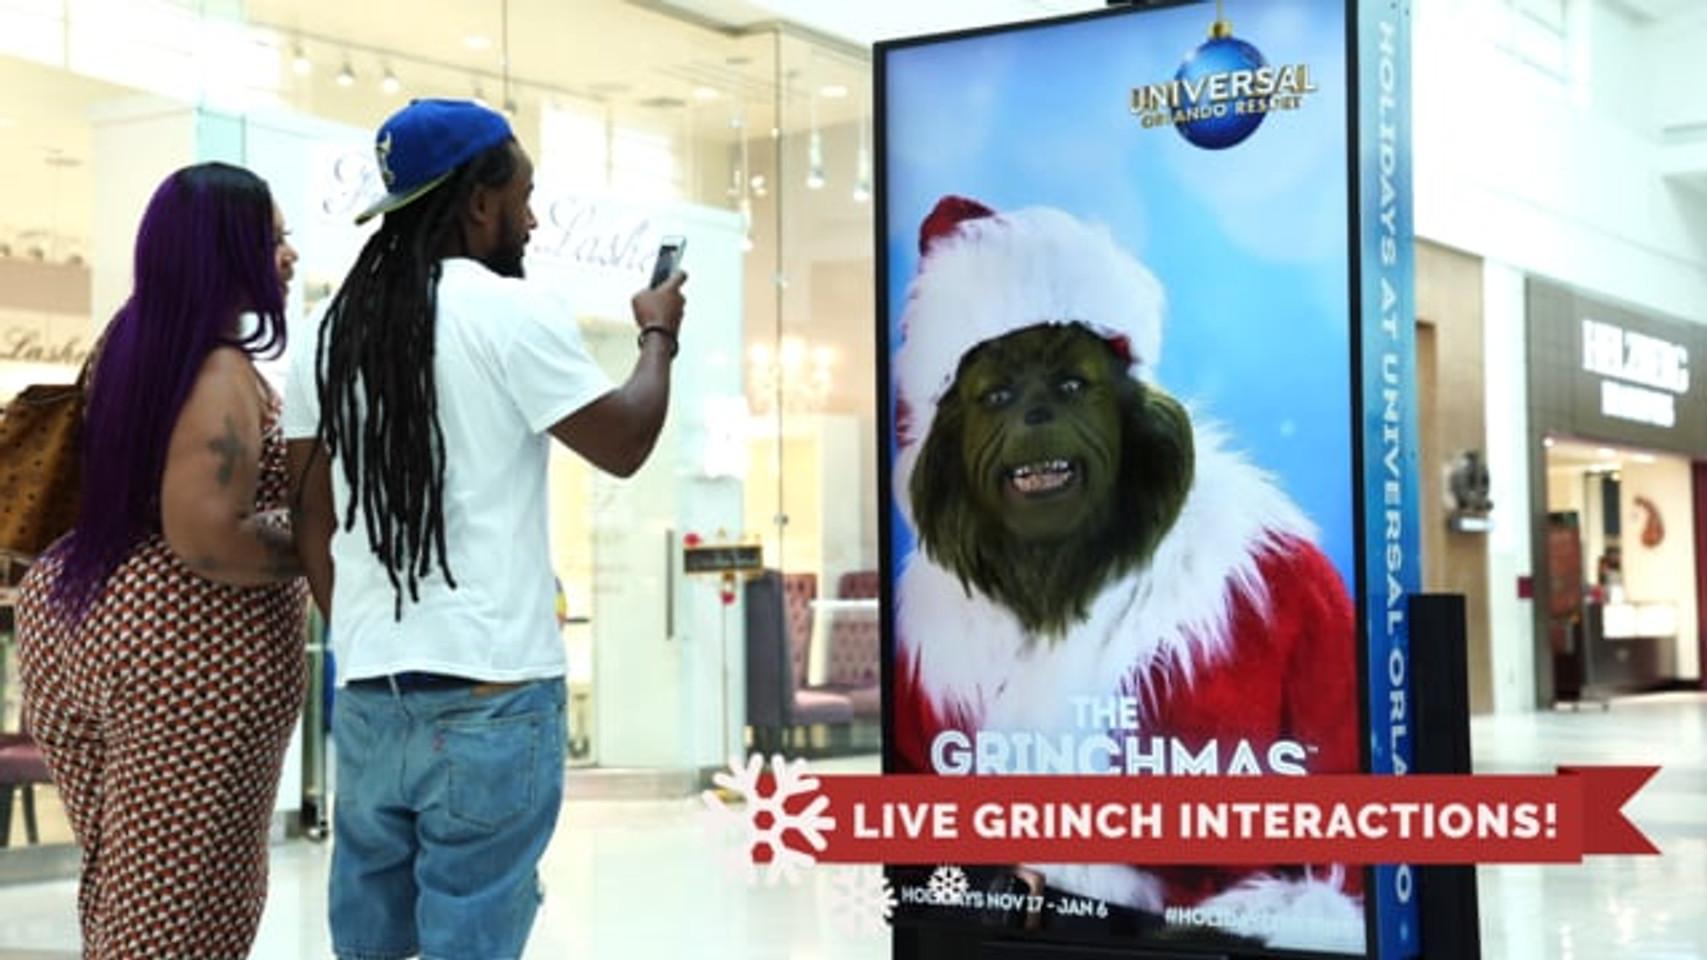 Monster XP Universal Orlando Resort Grinch Interactive Advertisement